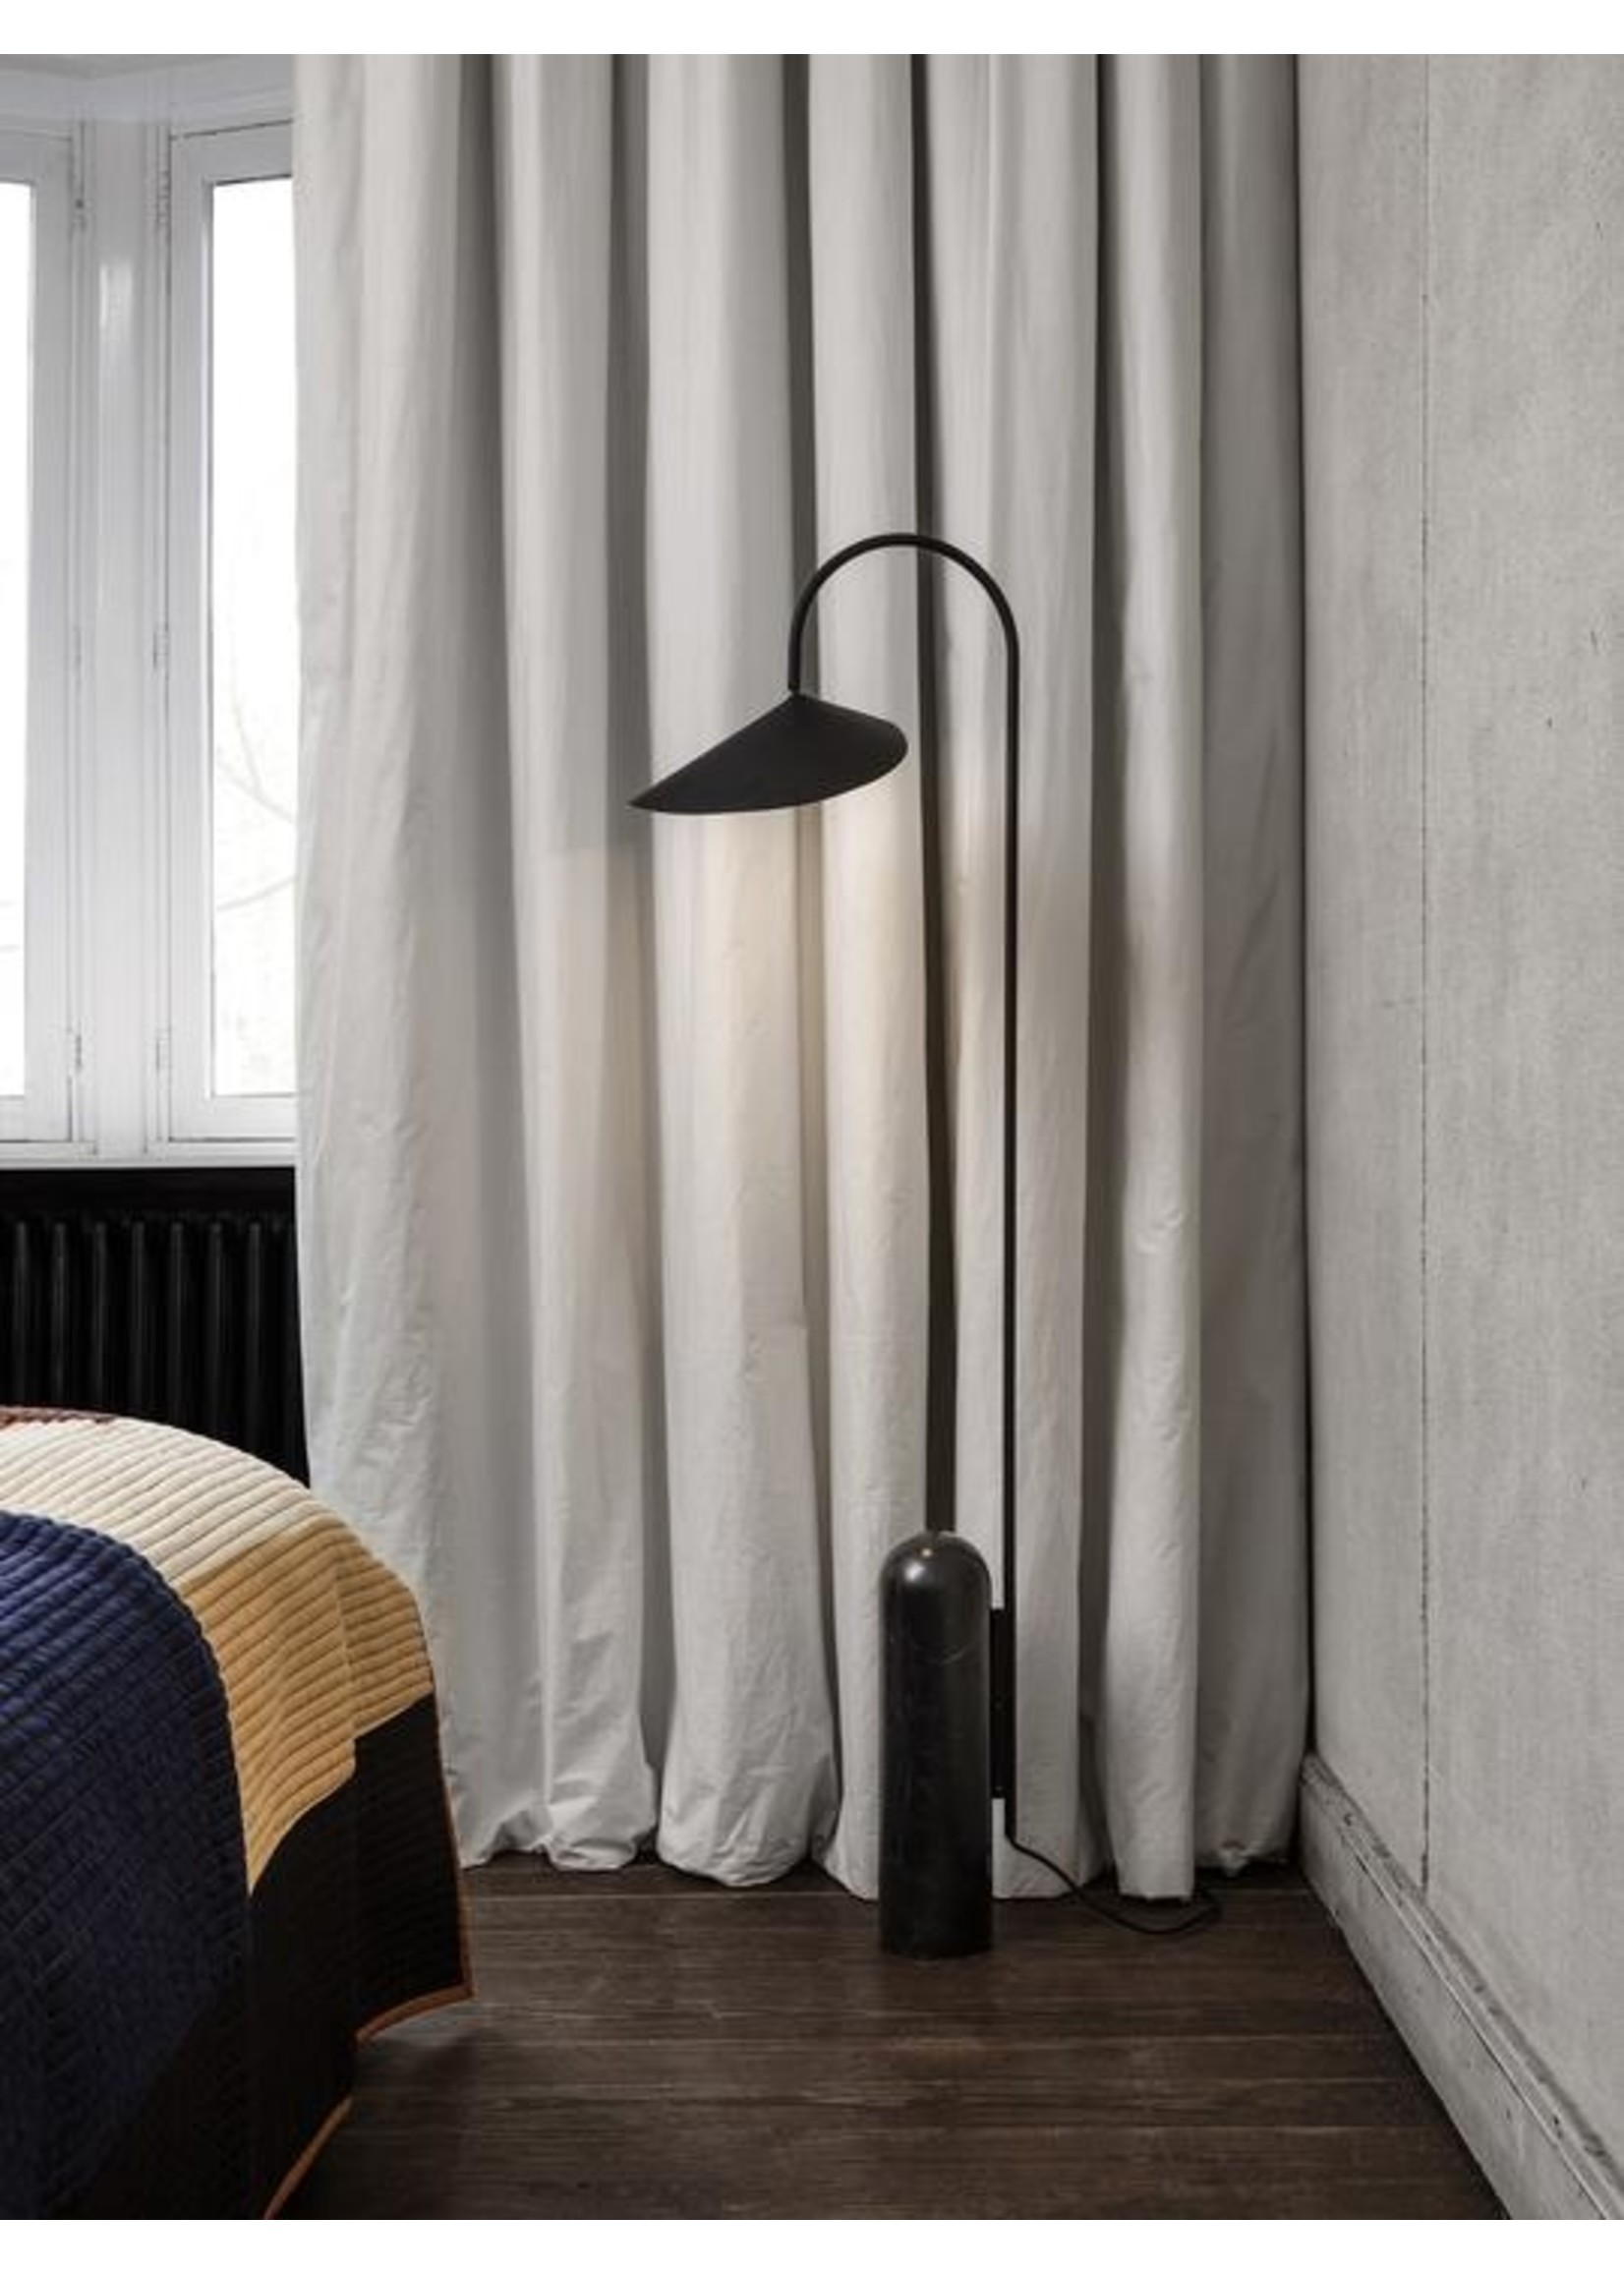 ferm LIVING ferm LIVING Arum Floor Lamp - Black